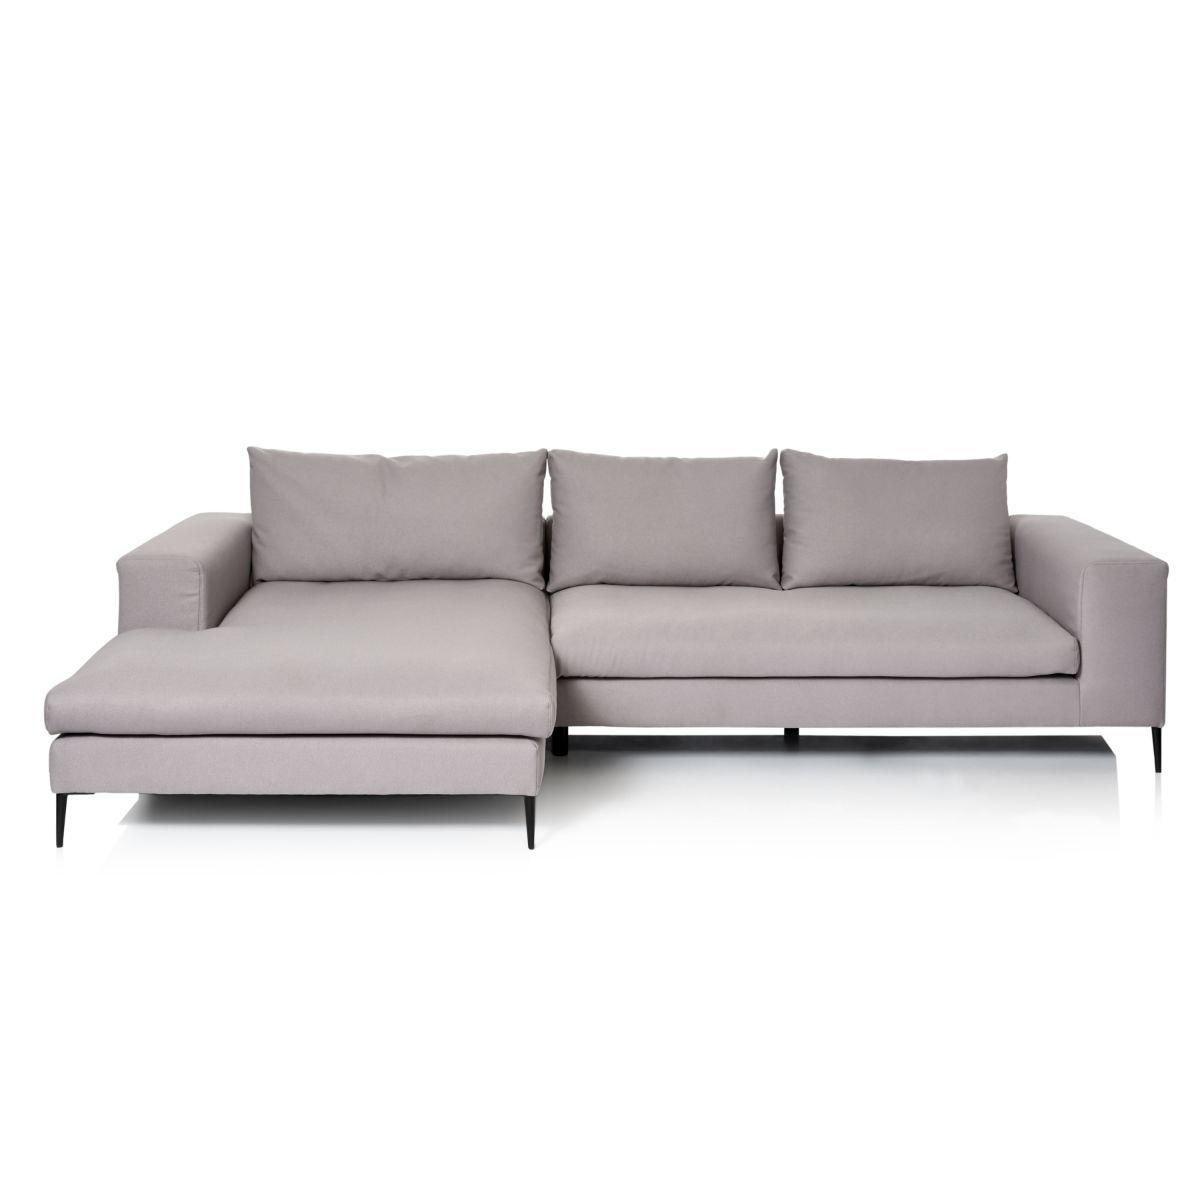 Ecksofa Modern Online Kaufen Bei Woonio Ecksofa Sofa Sofa Ottomane